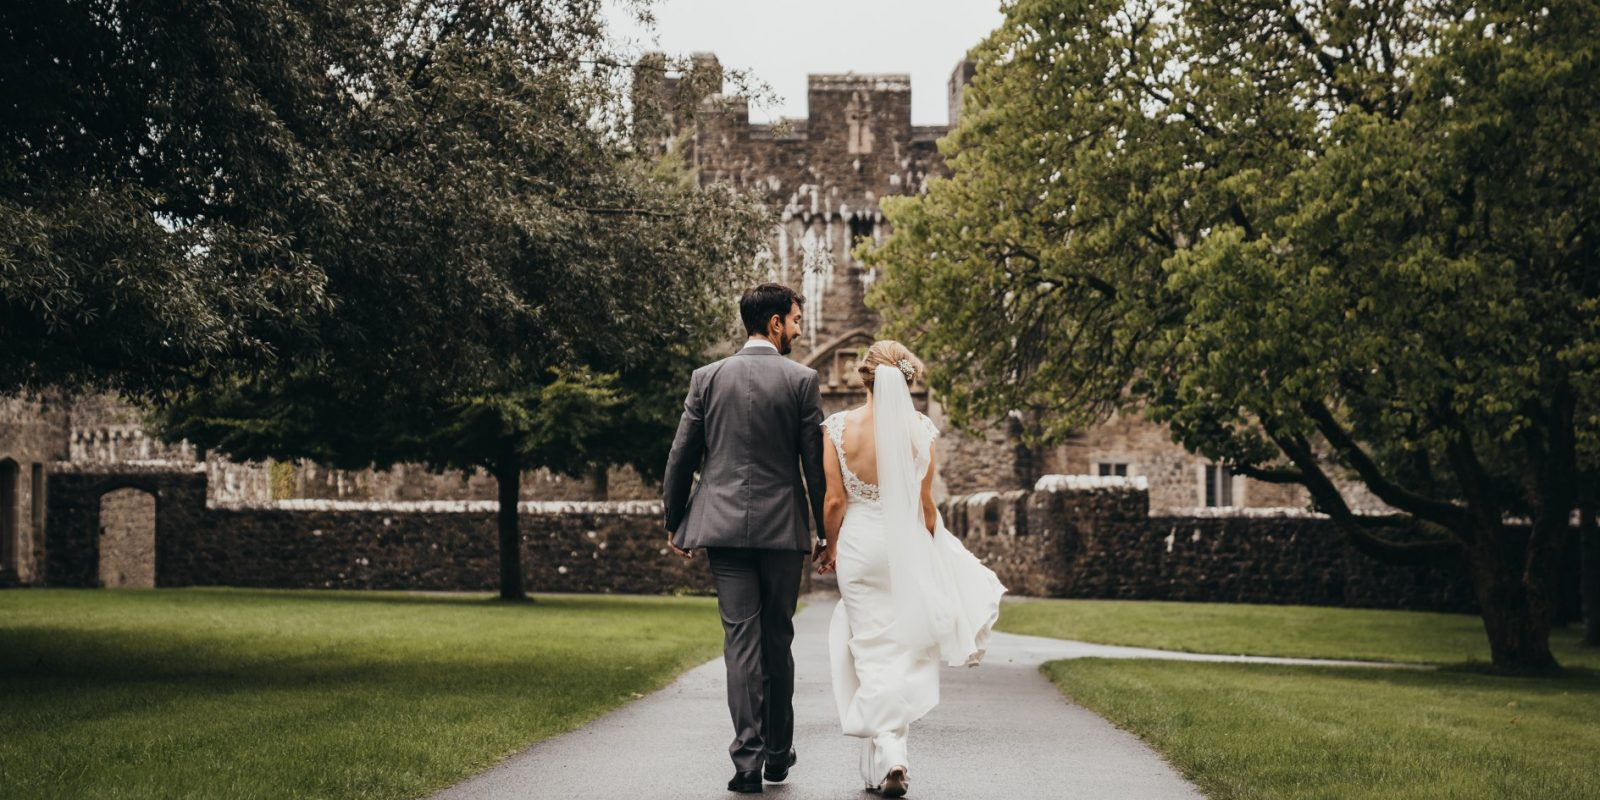 Walking down to st donat's castle